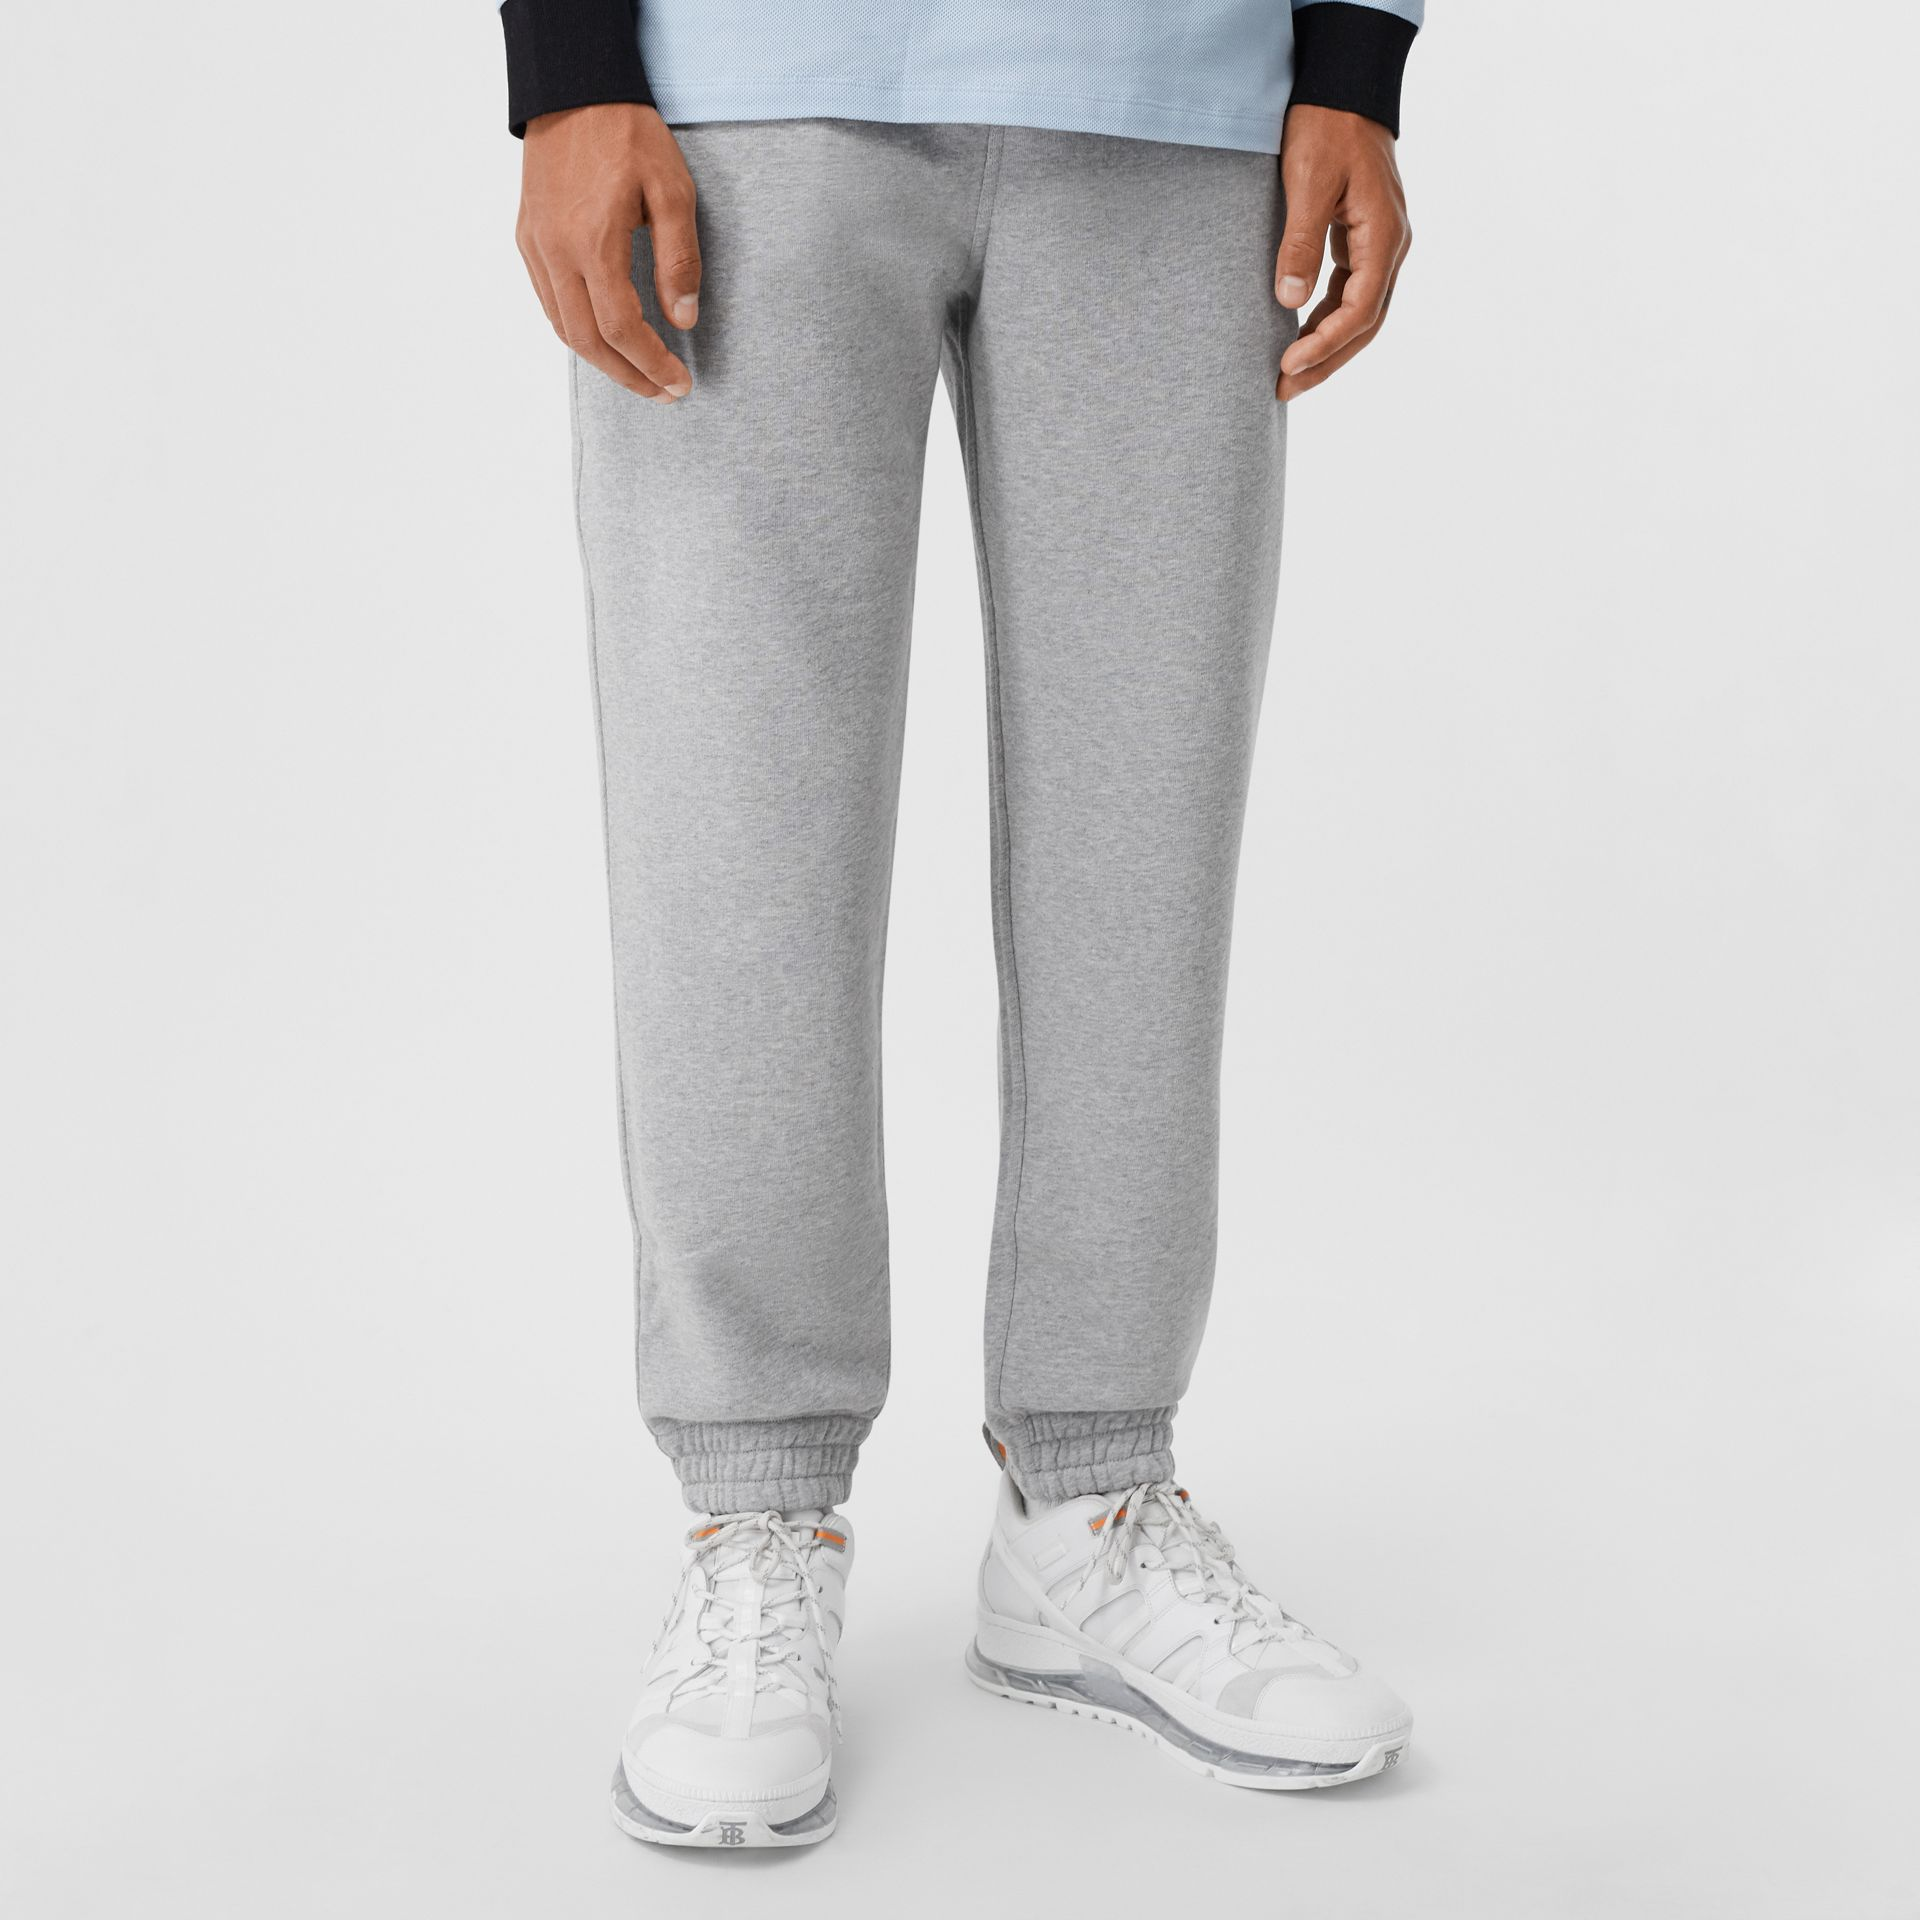 Logo Appliqué Cotton Trackpants in Pale Grey Melange - Men | Burberry United States - gallery image 4